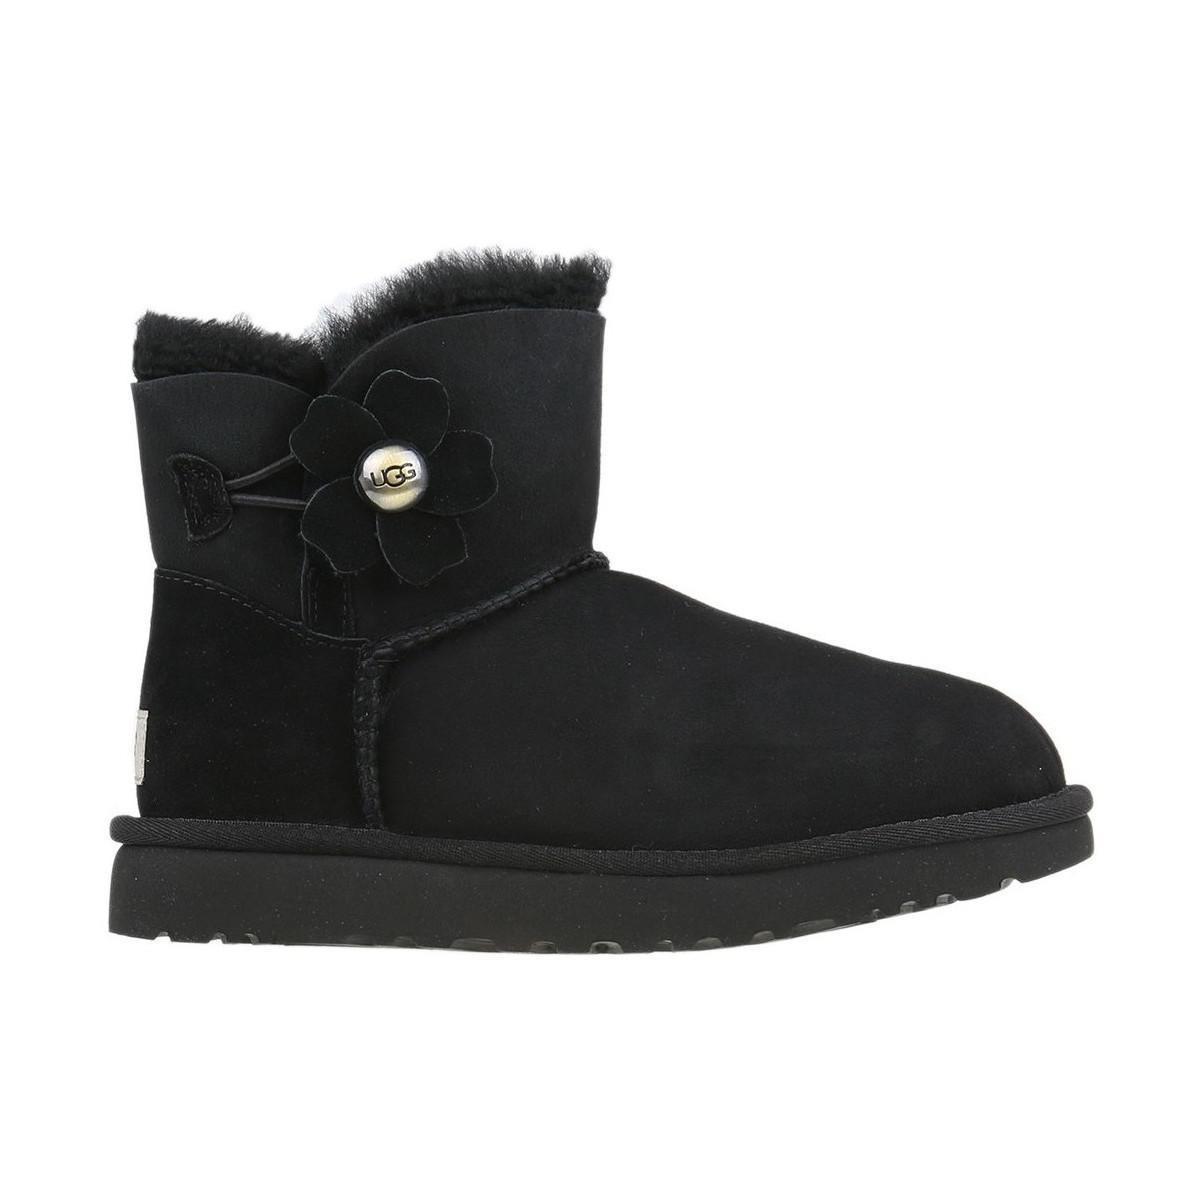 47d547f0322 UGG Mini Bailey Button Poppy Women's Snow Boots In Black in Black - Lyst